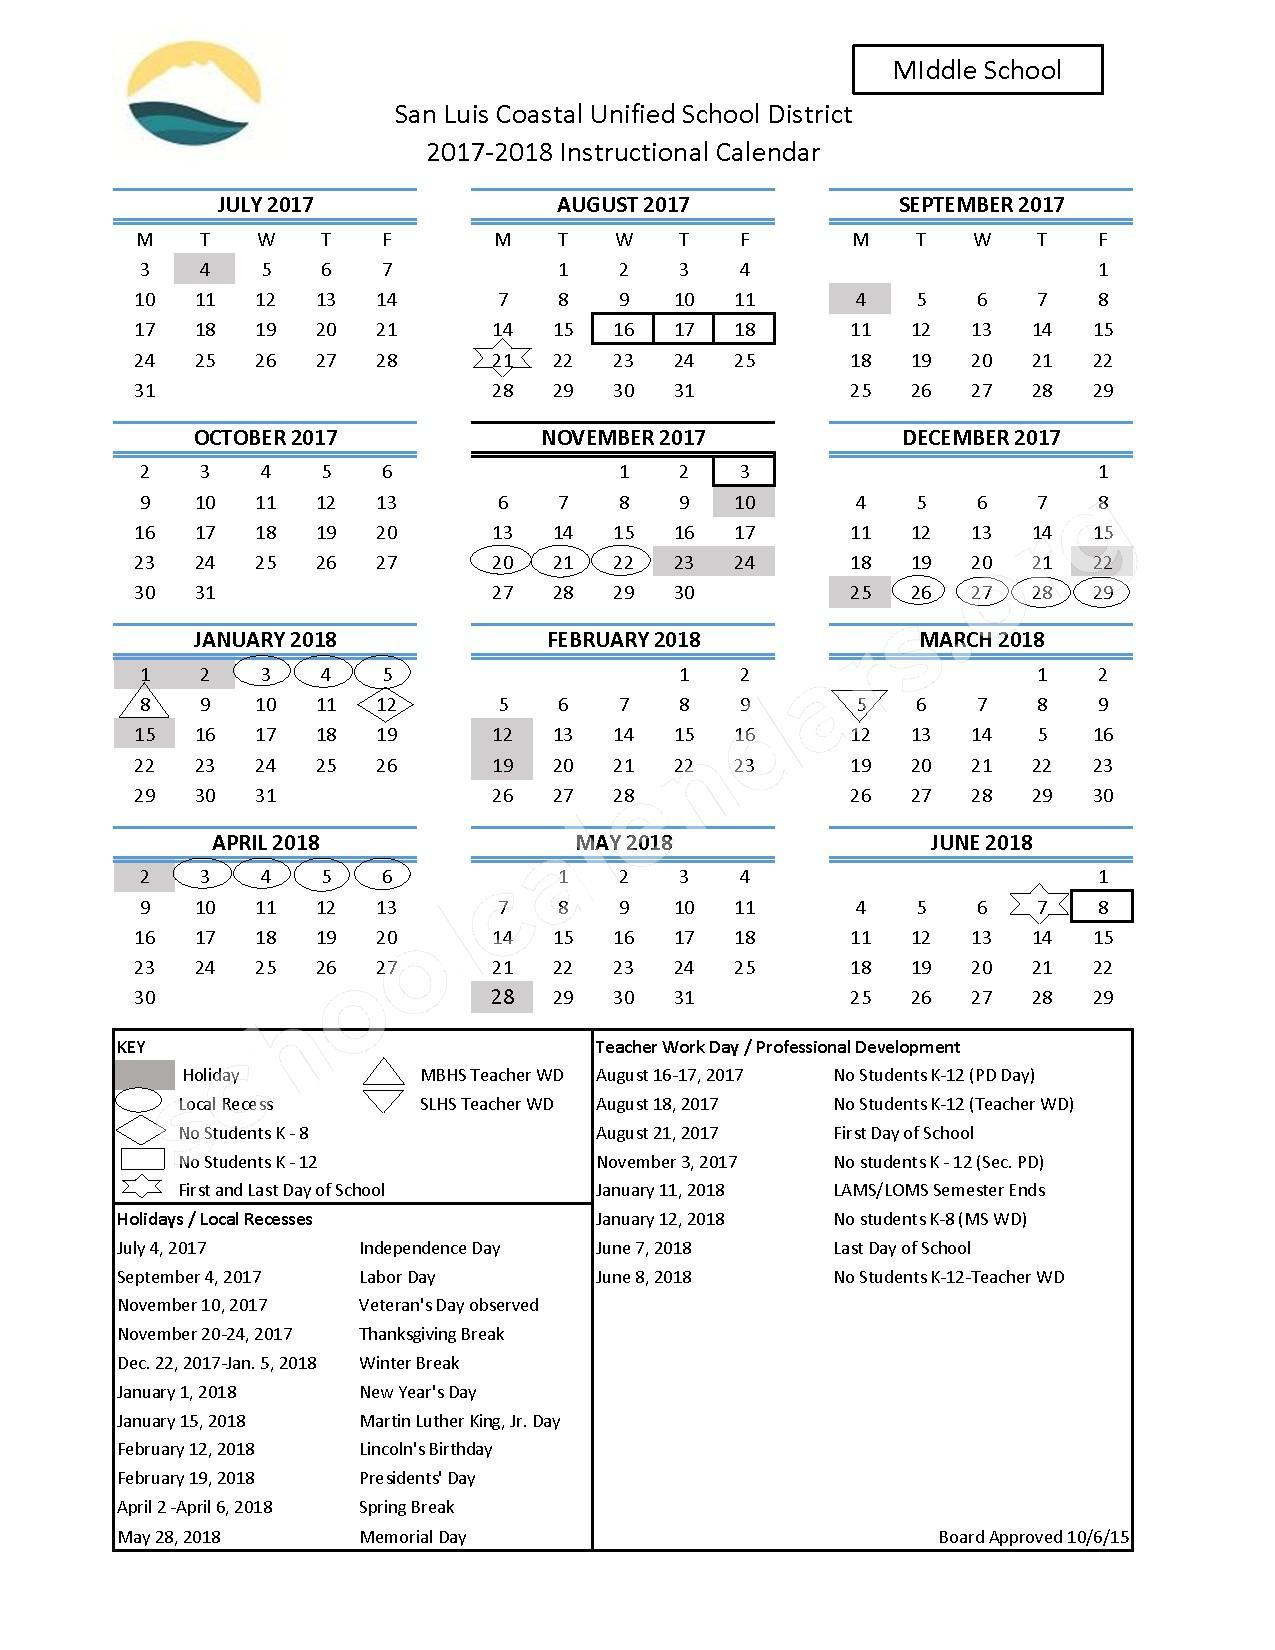 2017 - 2018 Middle School Calendar – San Luis Coastal Unified School District – page 1